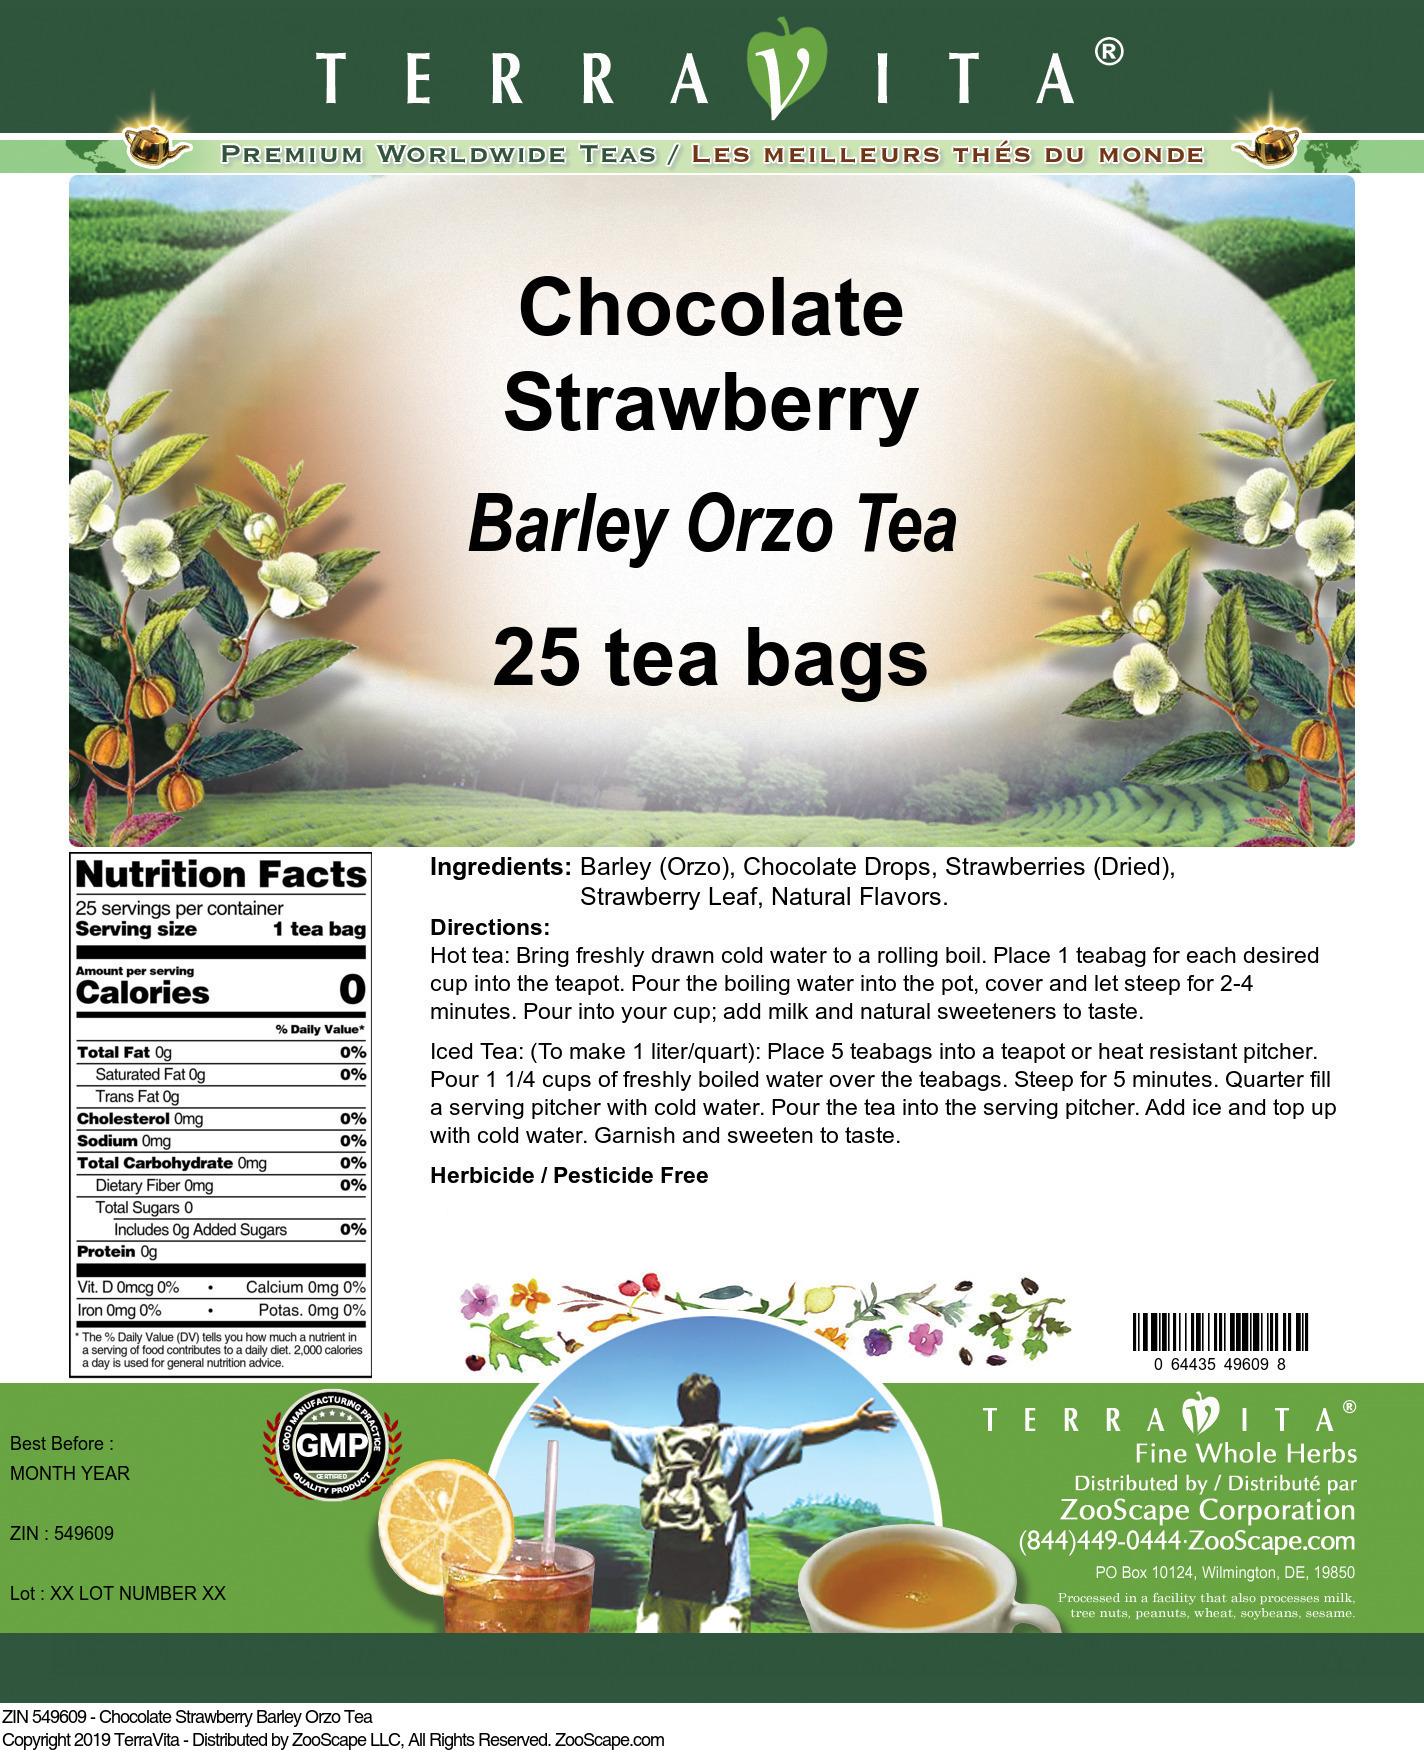 Chocolate Strawberry Barley Orzo